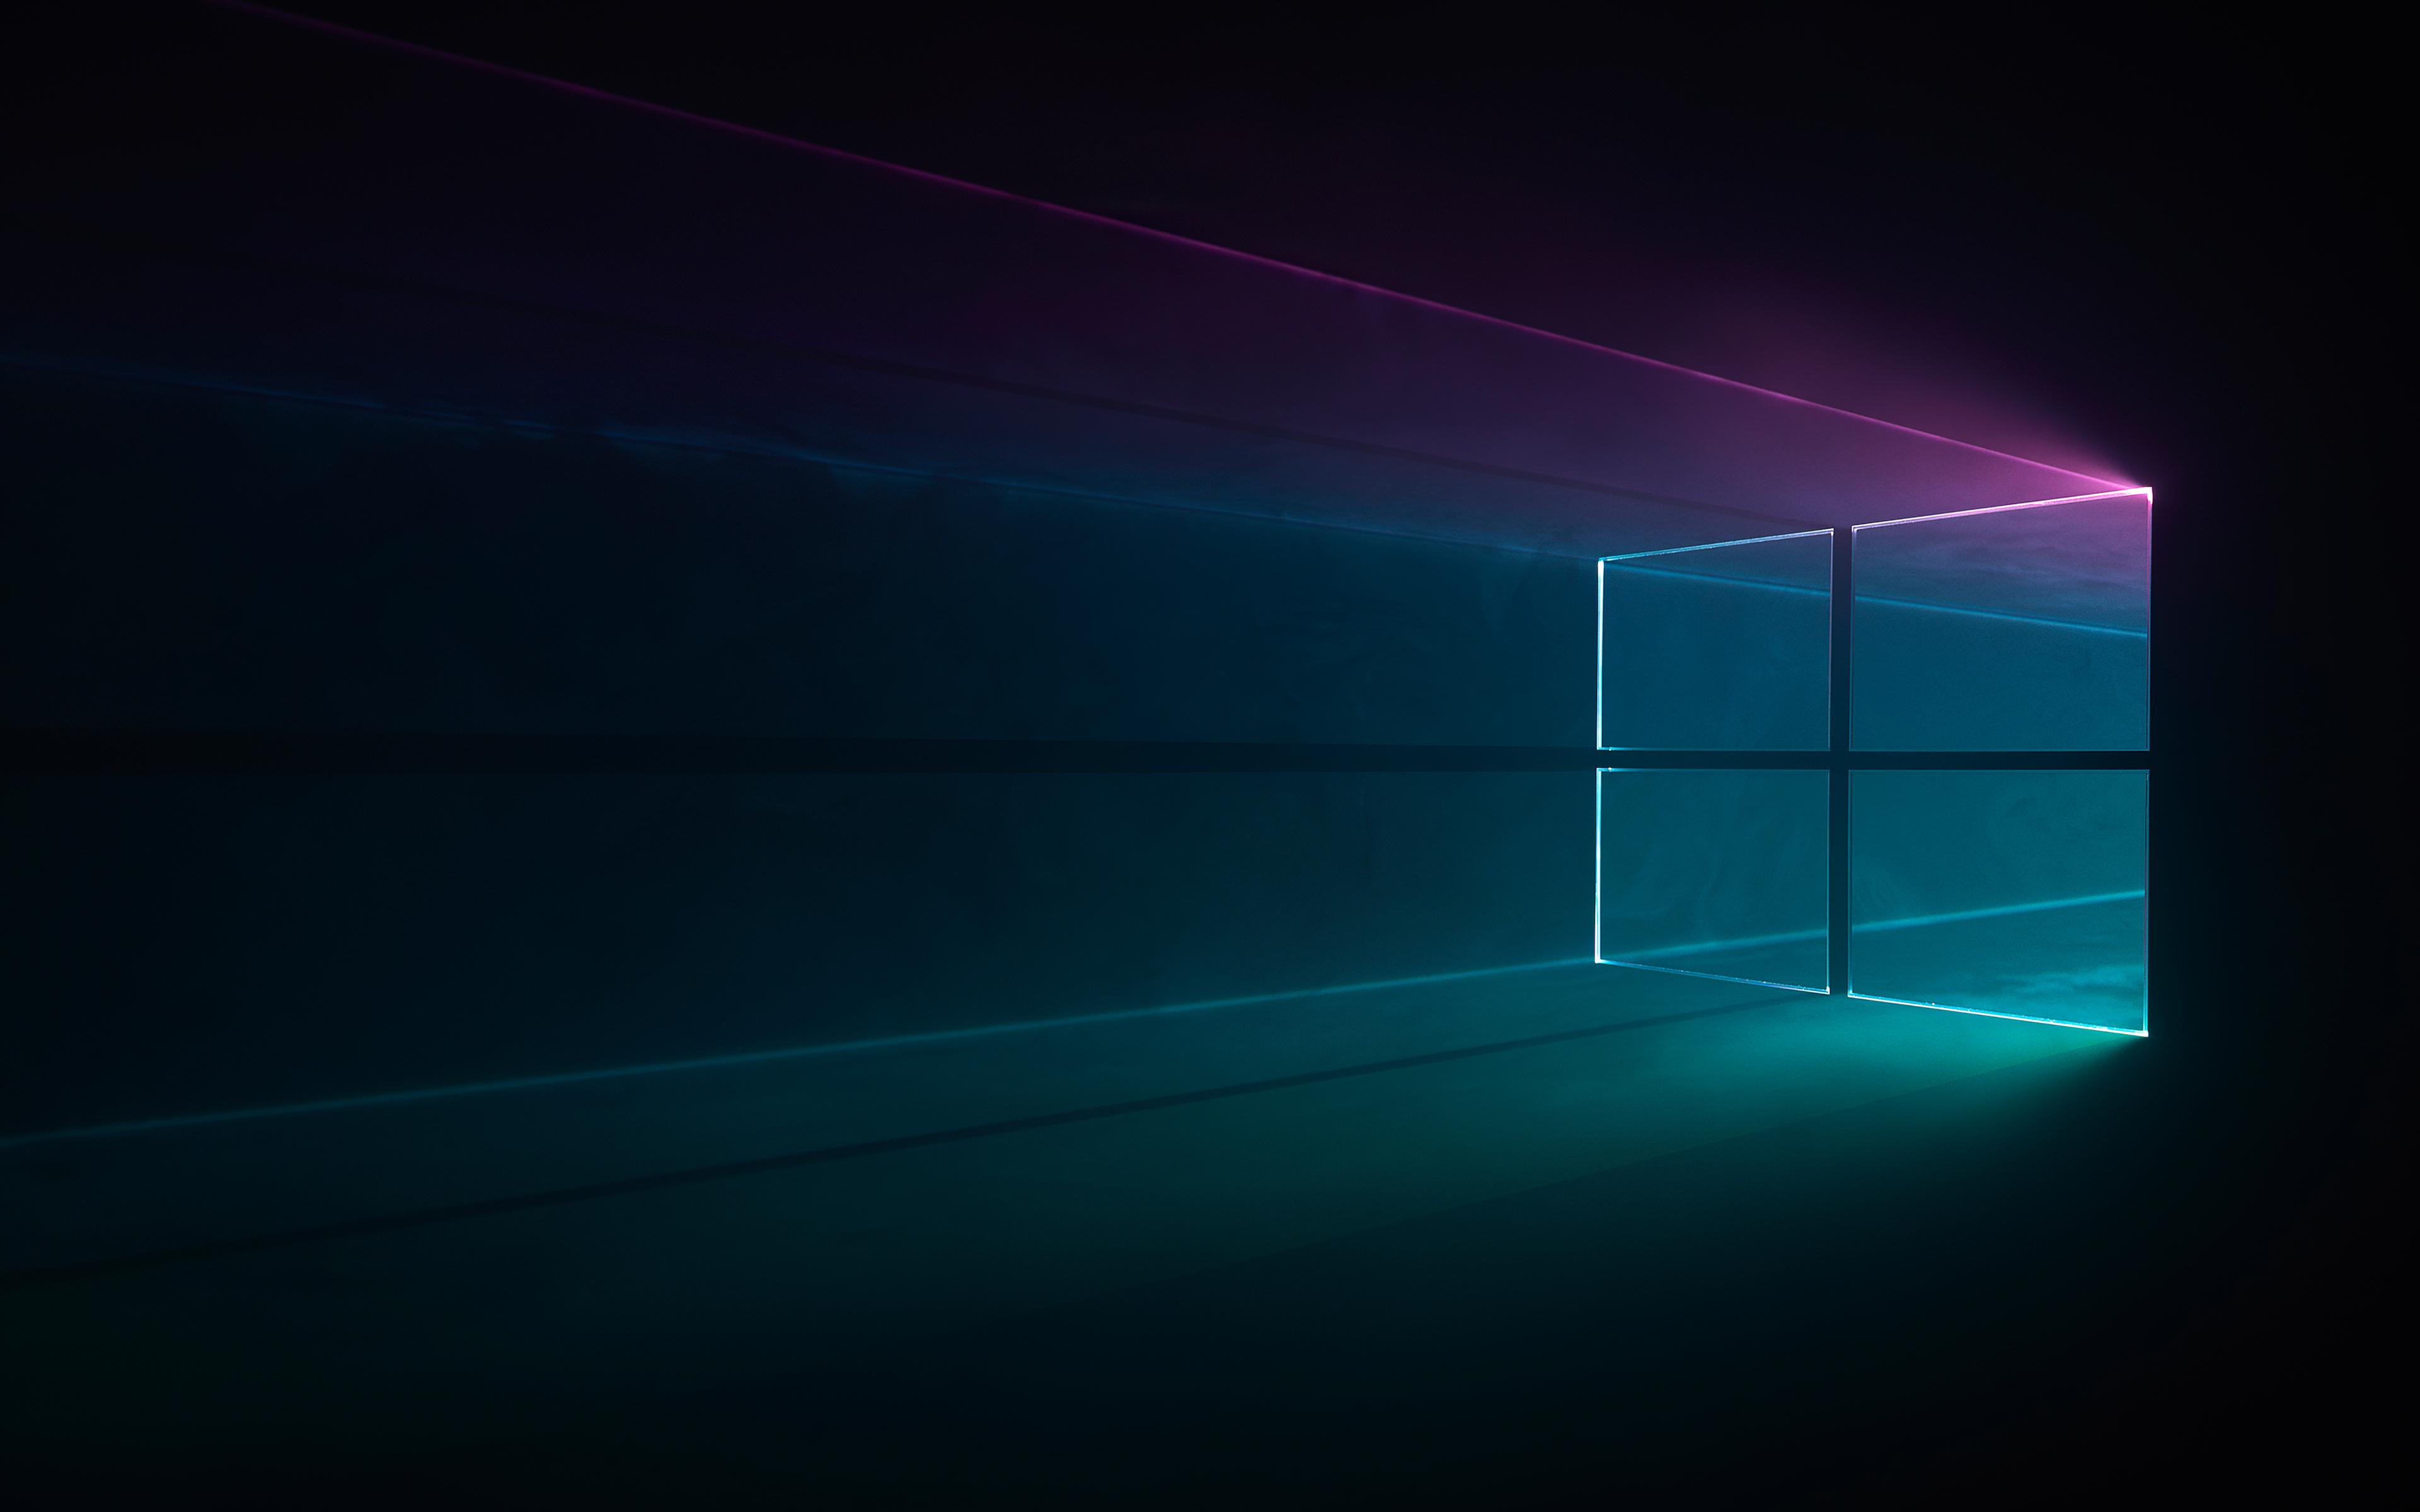 windows-10-process-beauty-5k-yt.jpg